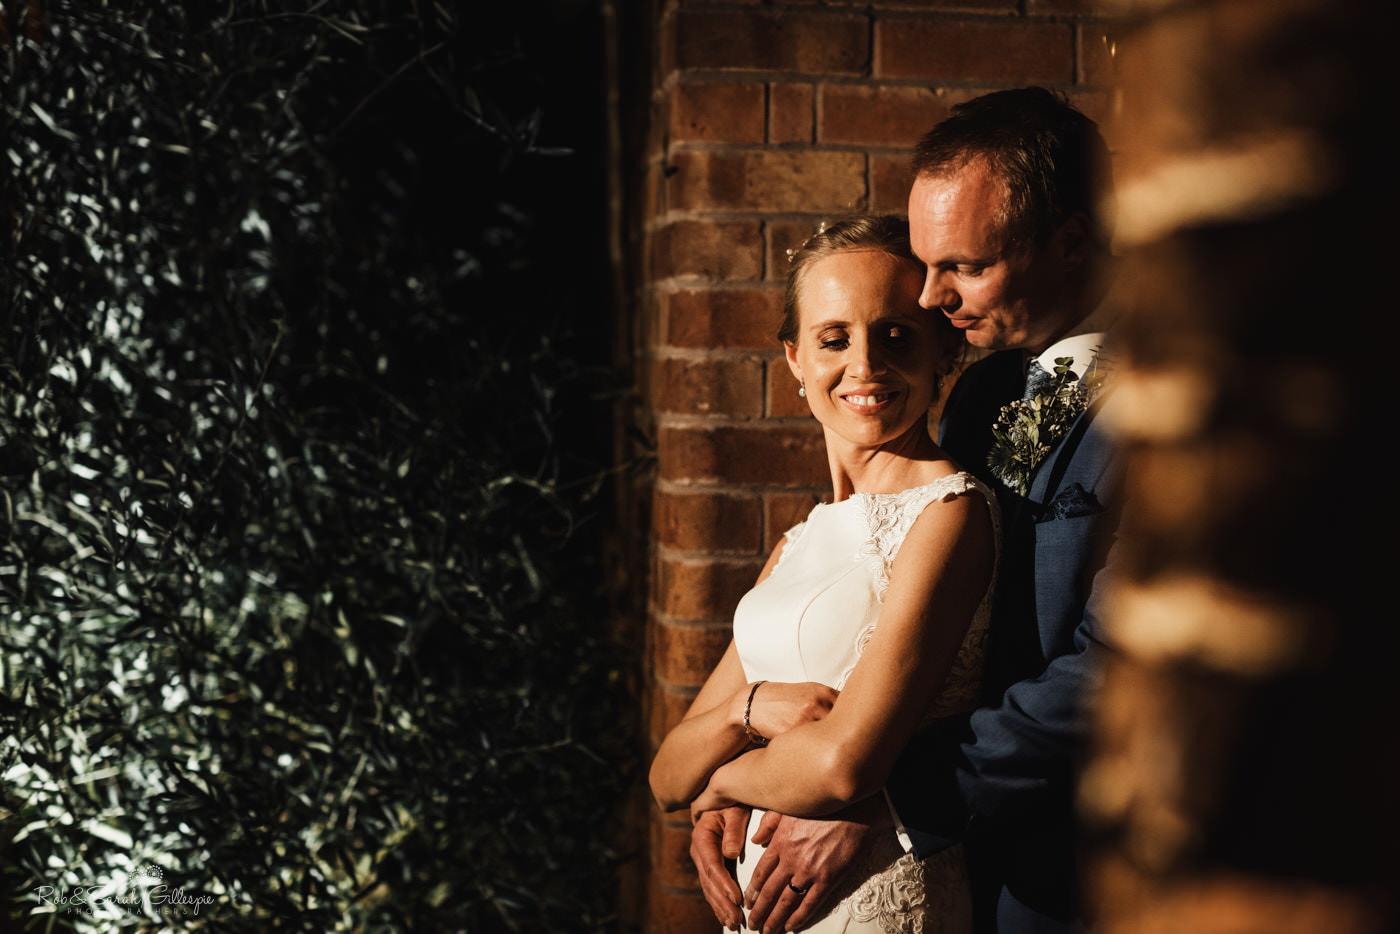 Wedding at Swallows Nest Barn in Warwickshire